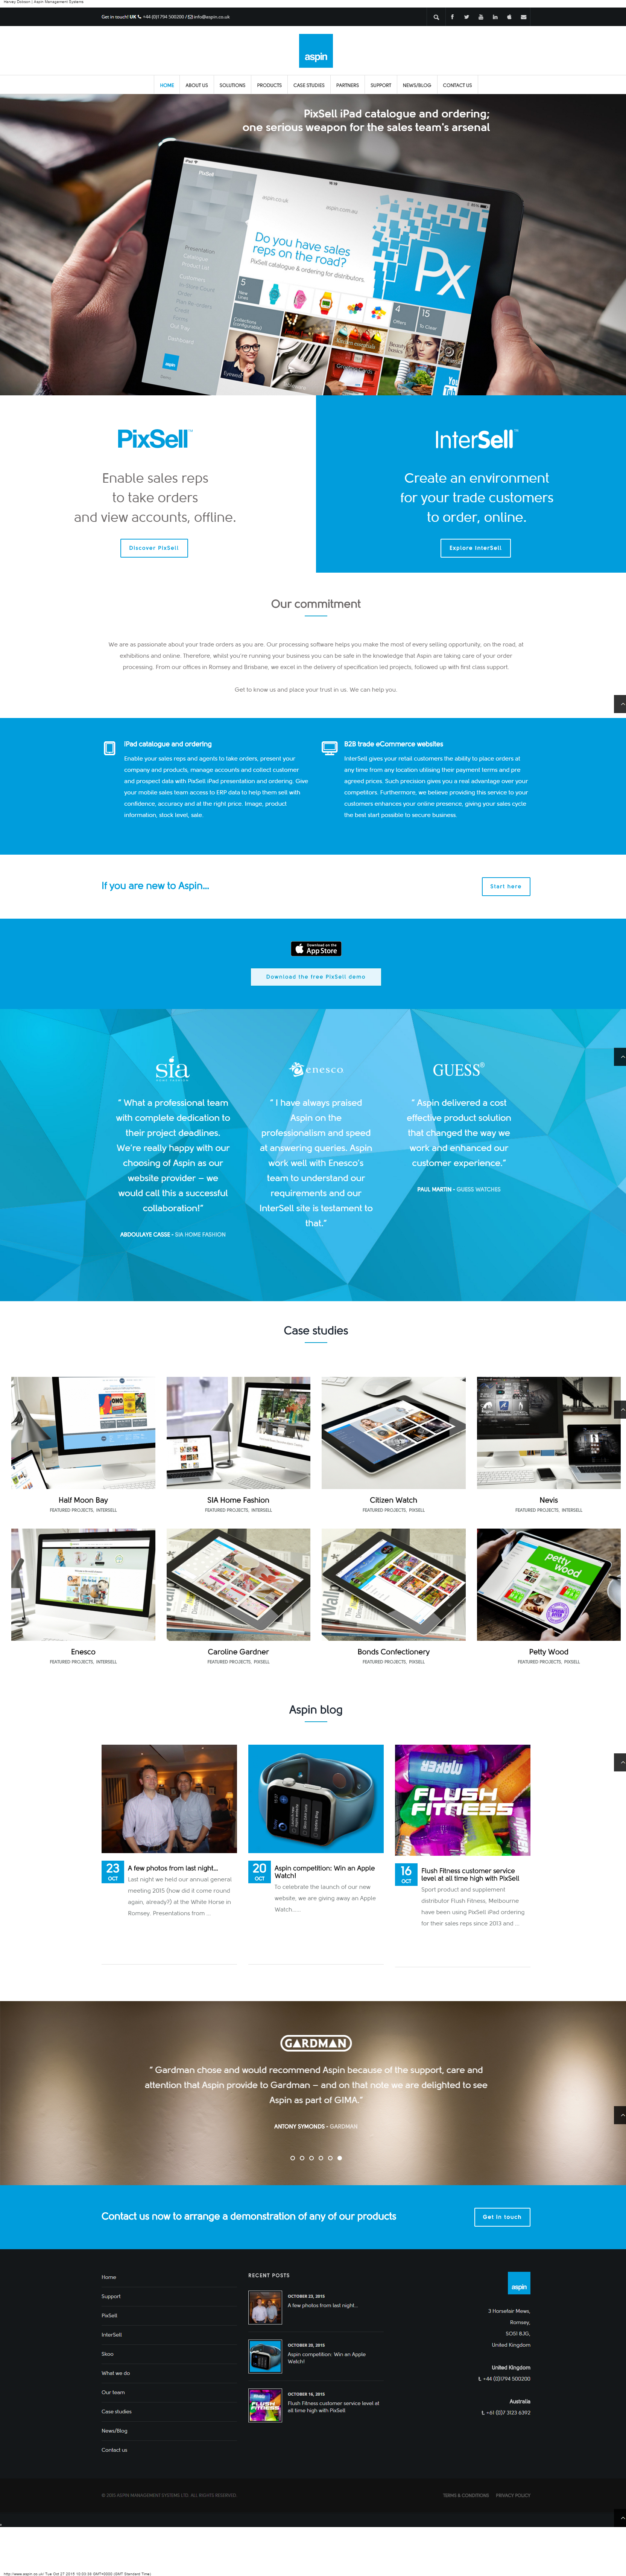 2015 Aspin homepage